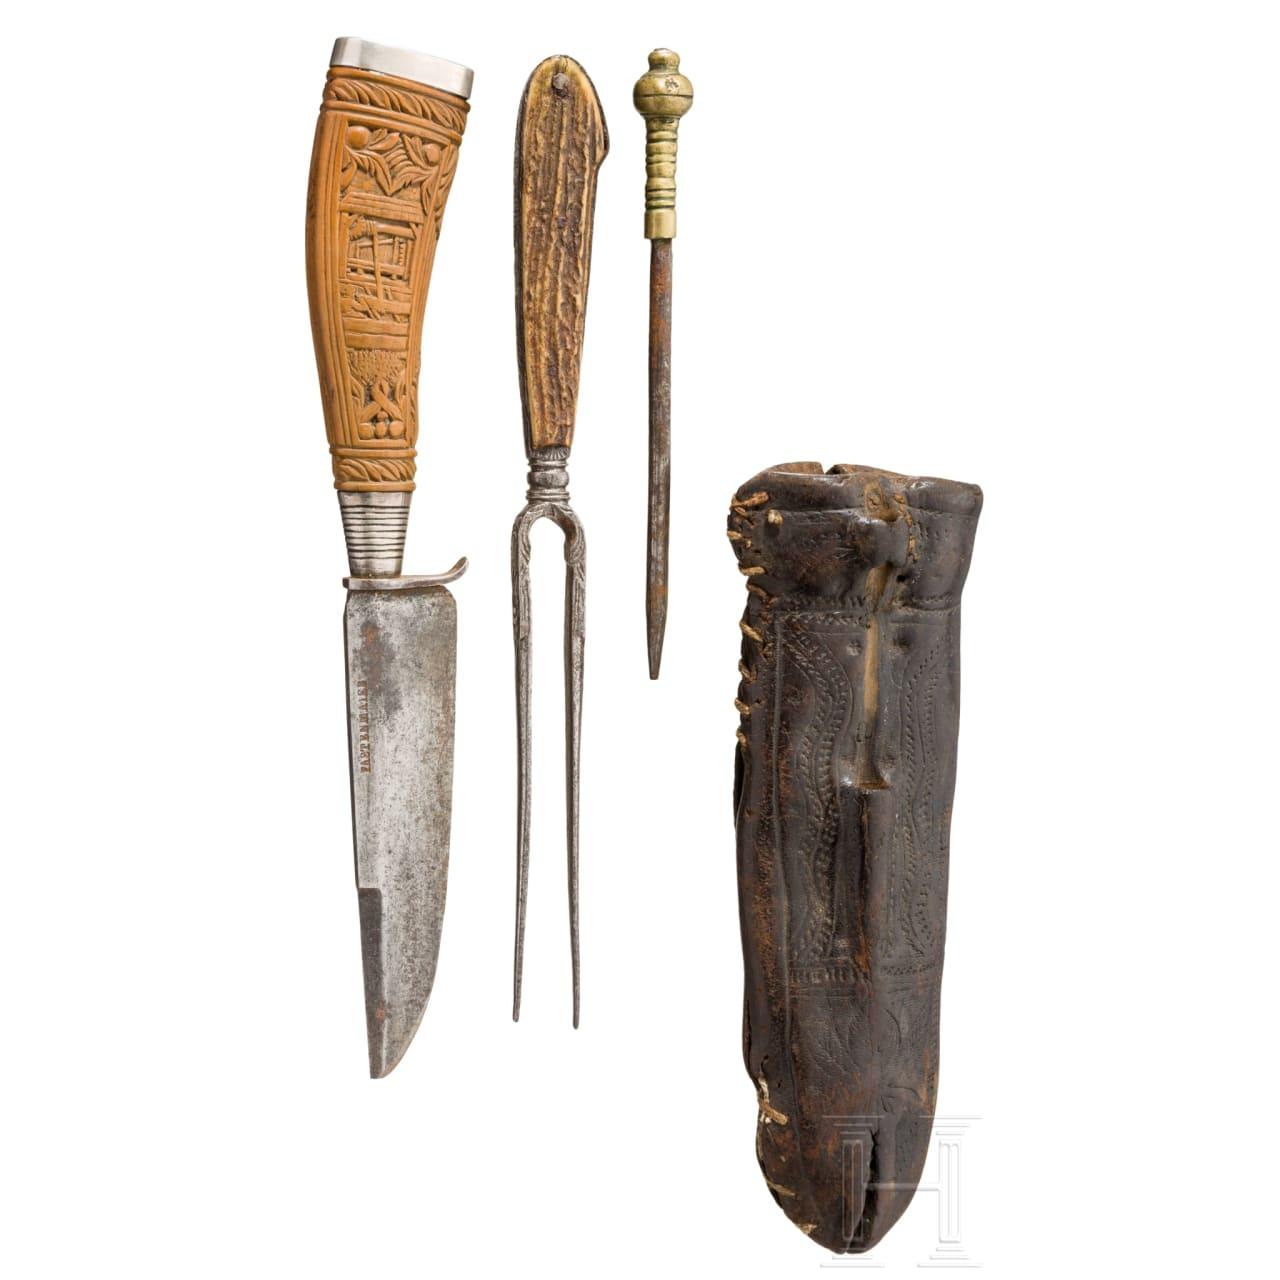 A waggoner's set of cutlery, alpine, beginning of 19th century